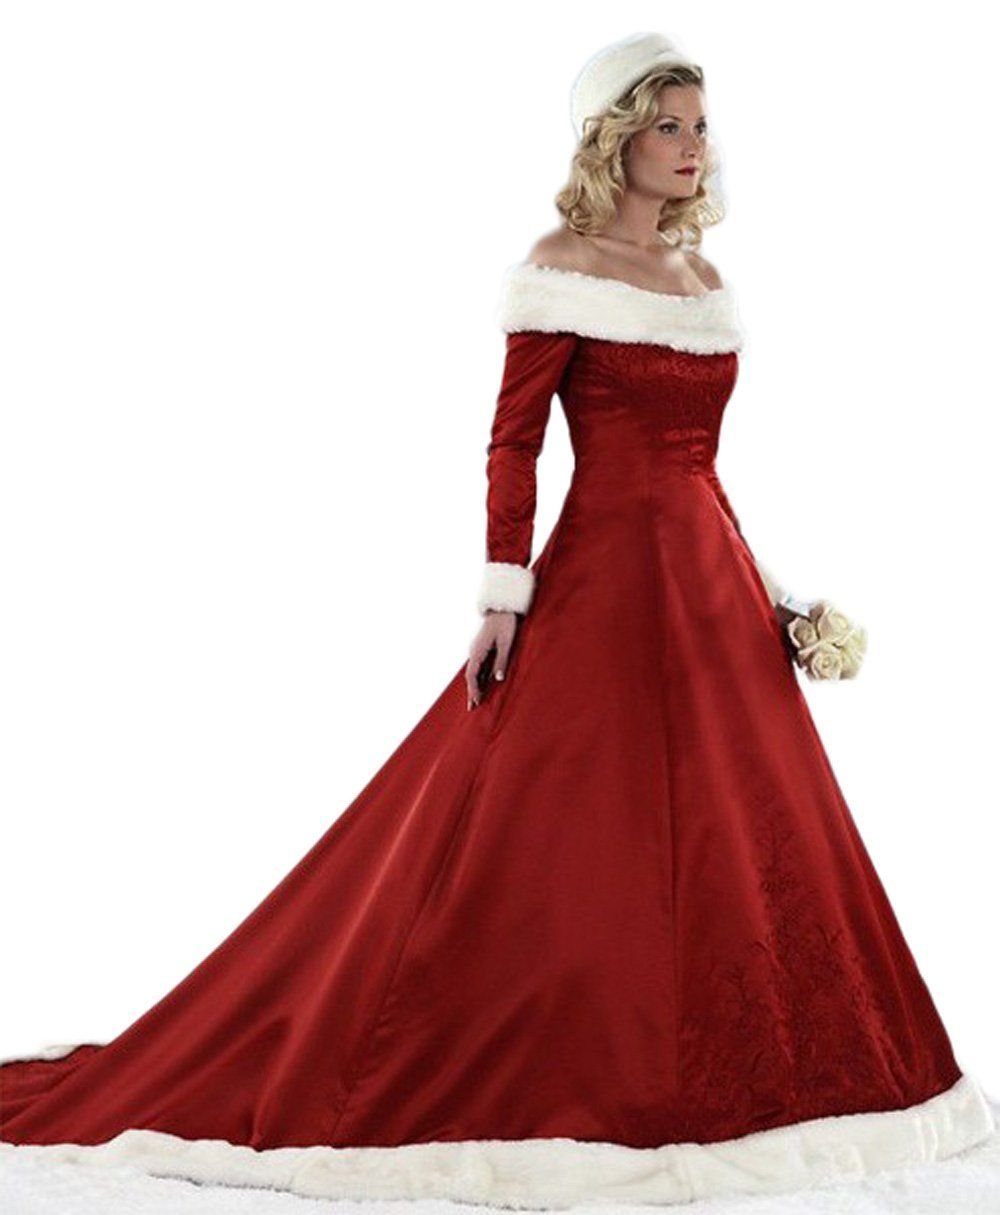 Chupeng womens long sleeves aline bridal dresses red ball